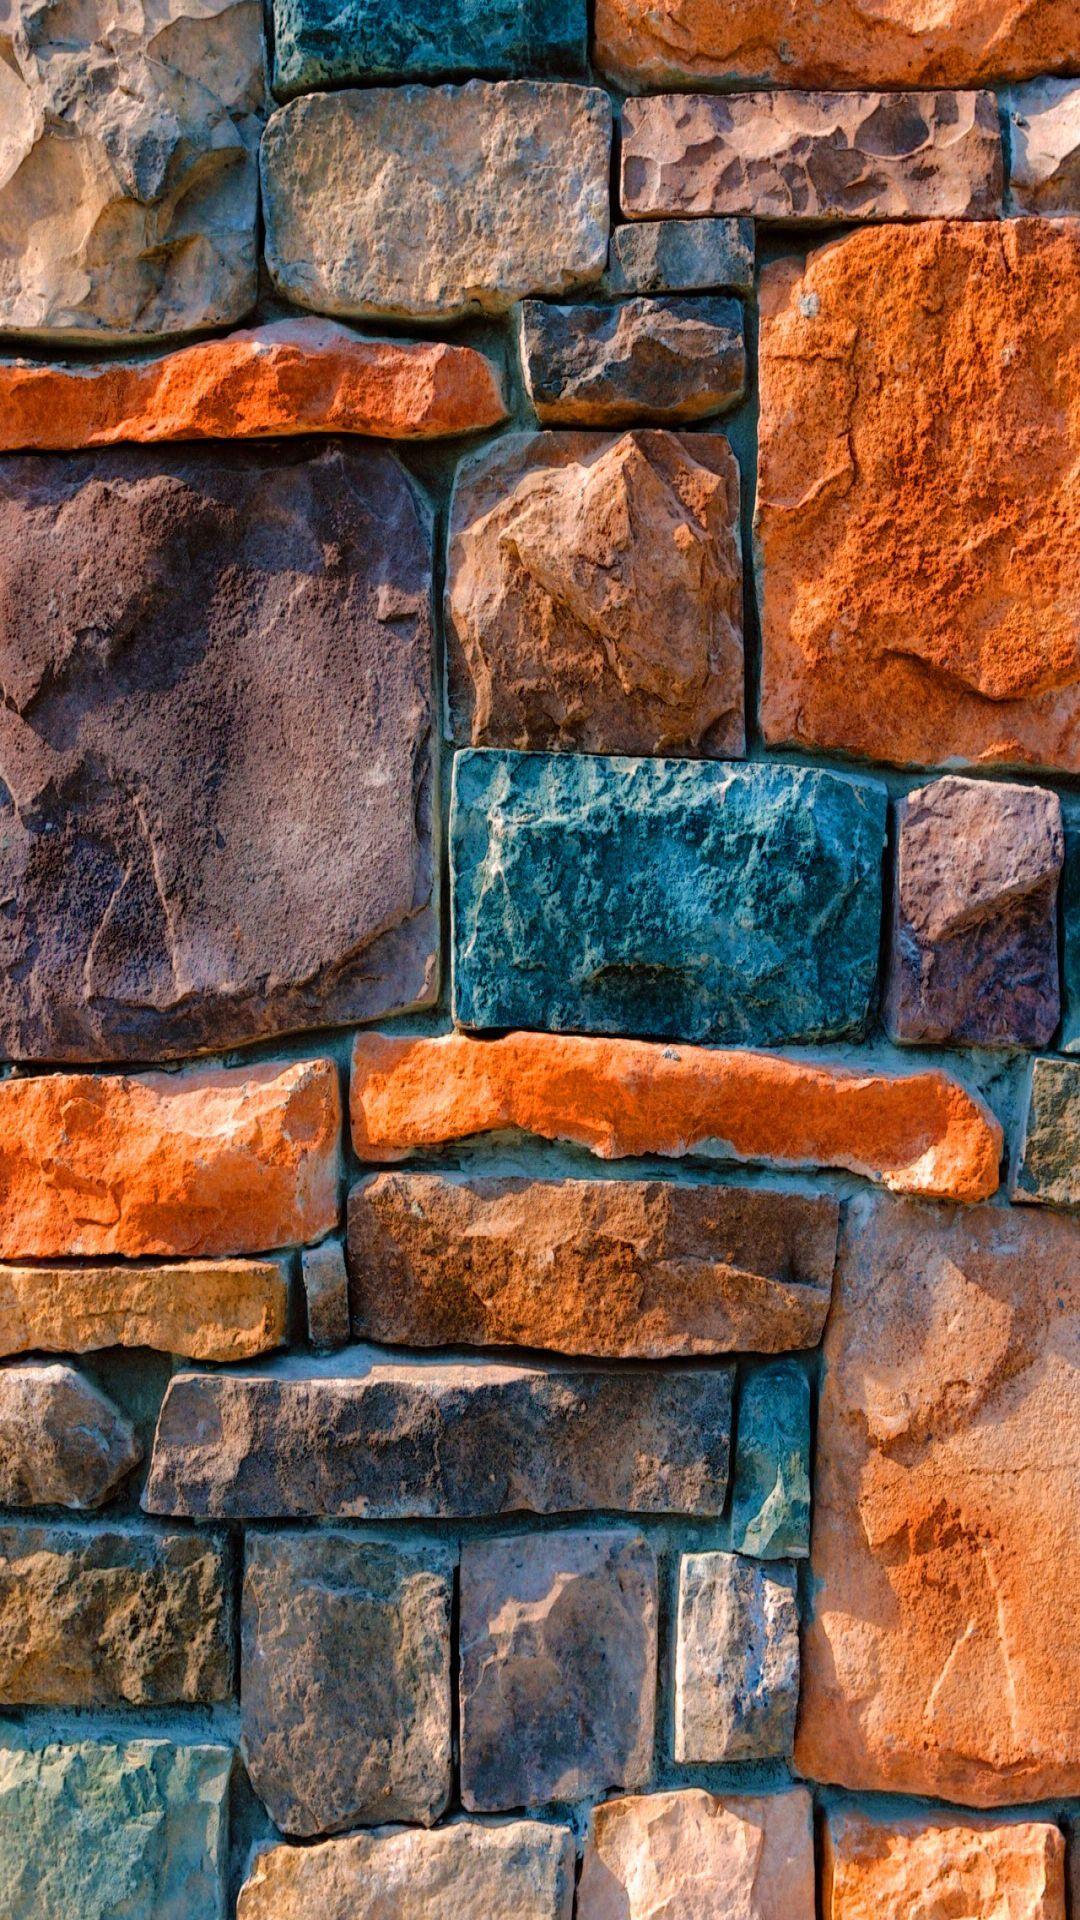 Colorful Brick Image Colorful Brick Image wallpapers